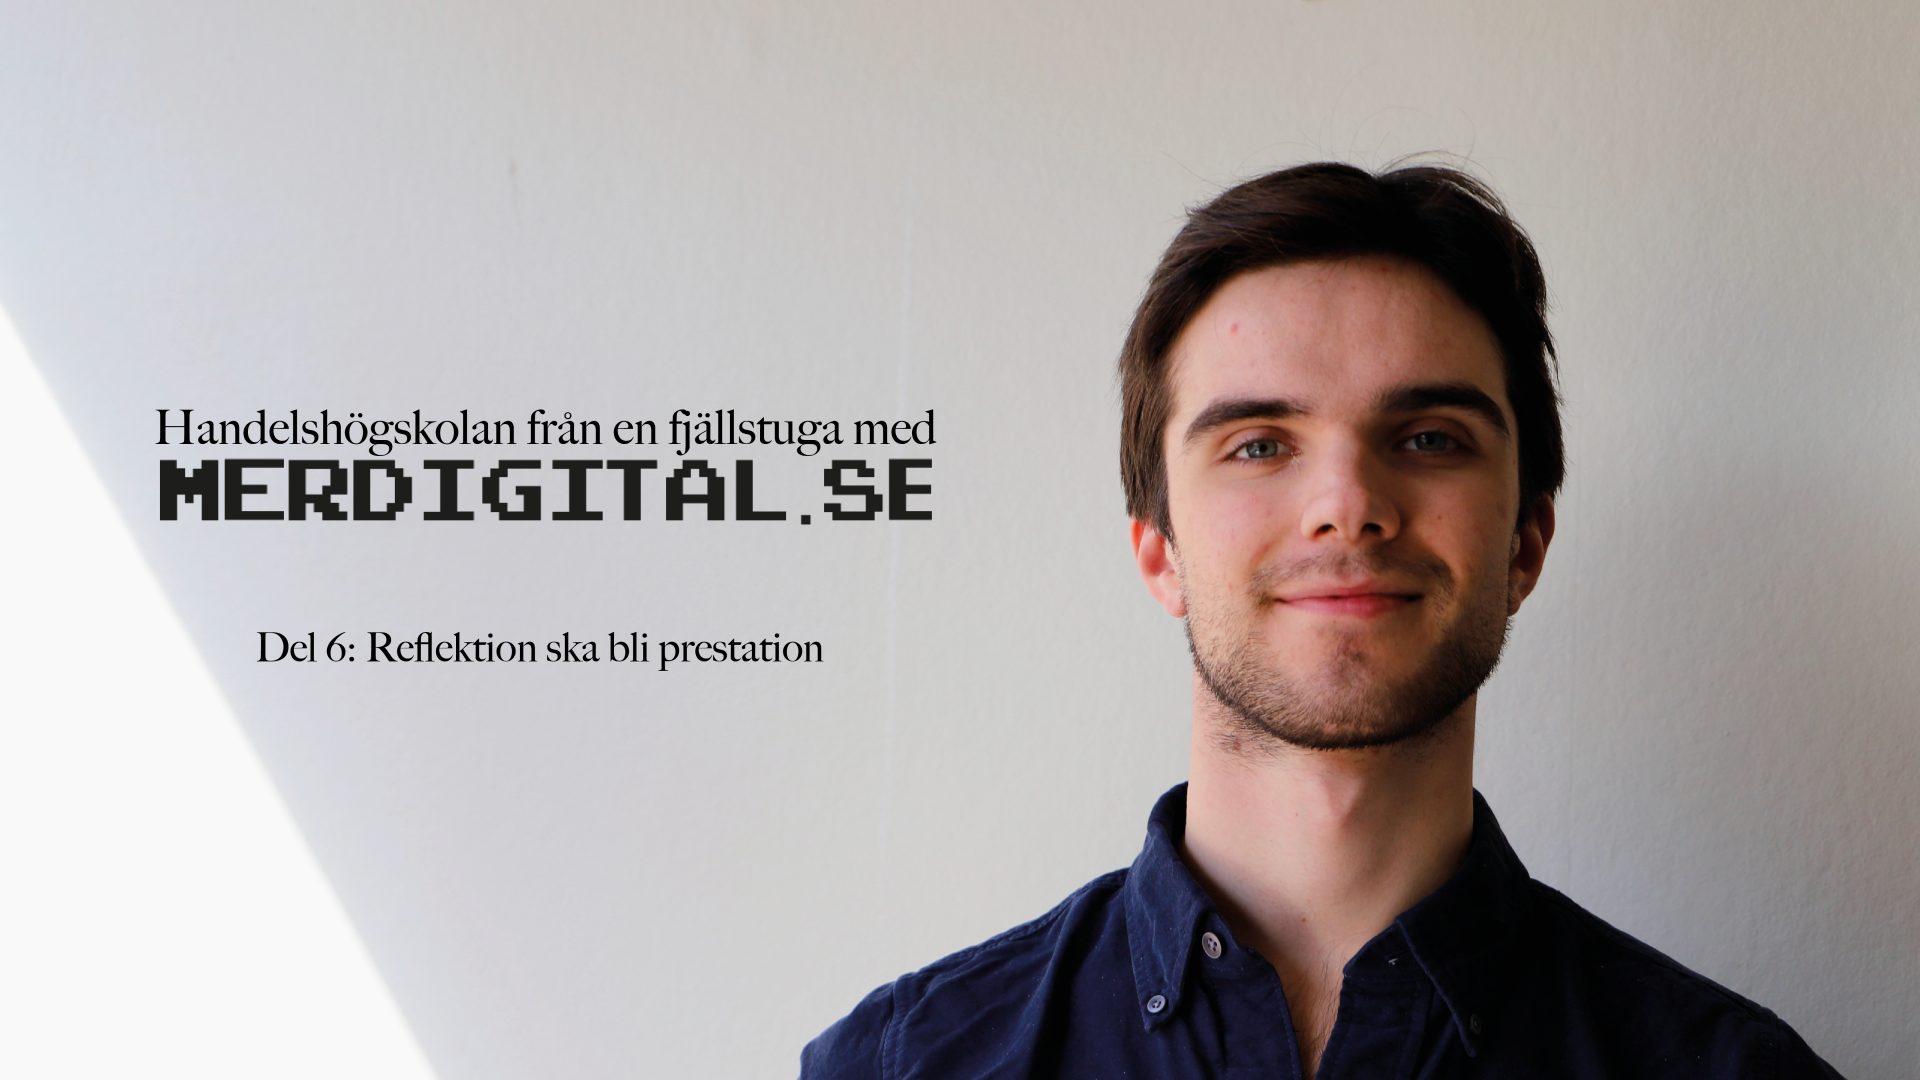 Andreas Hjelm